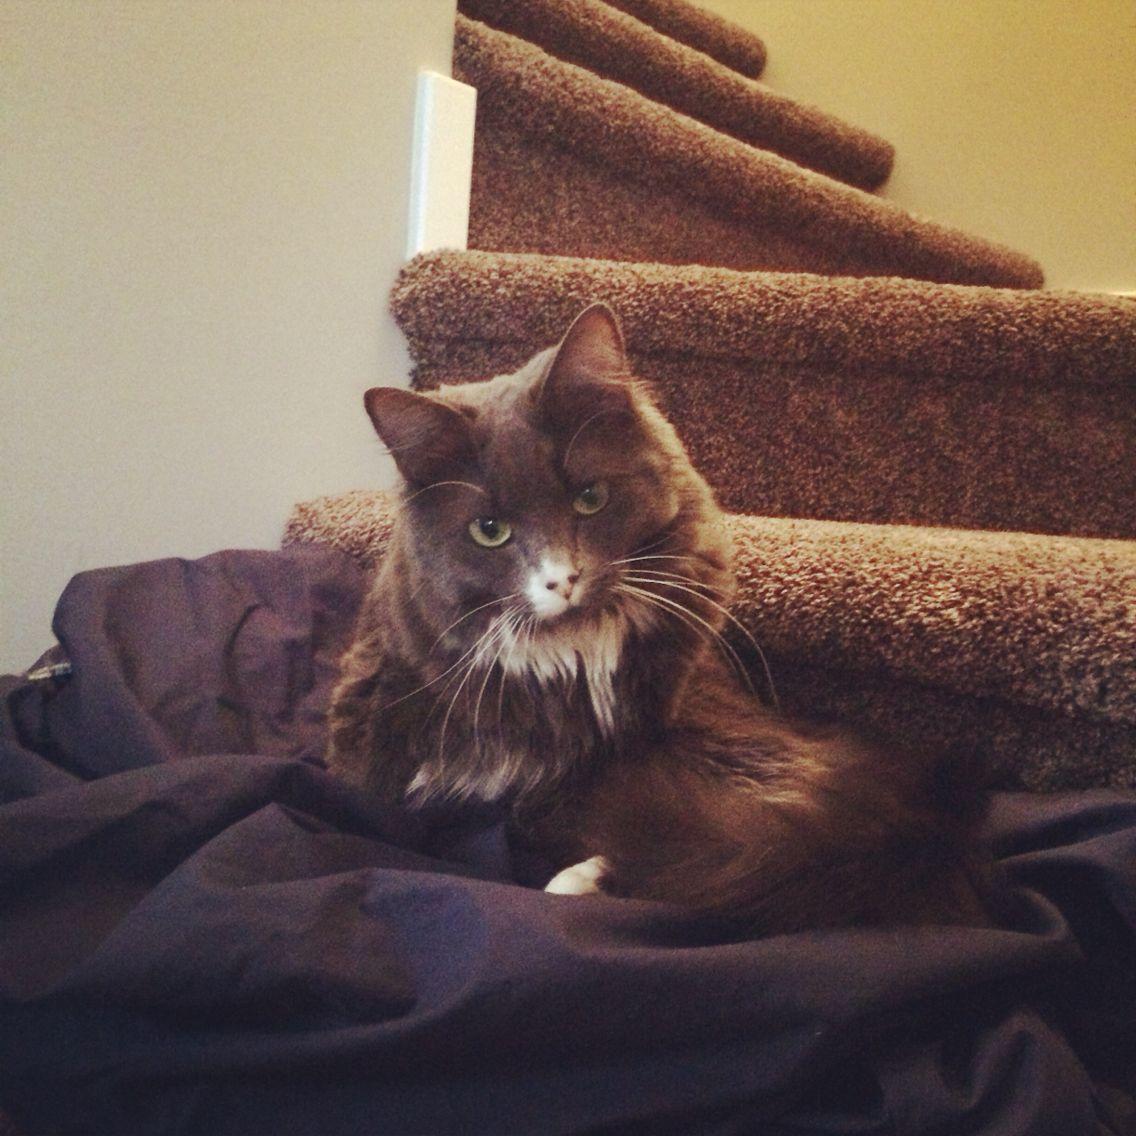 Misty_fluffybum Instagram rising star 😉 Animals, Cute